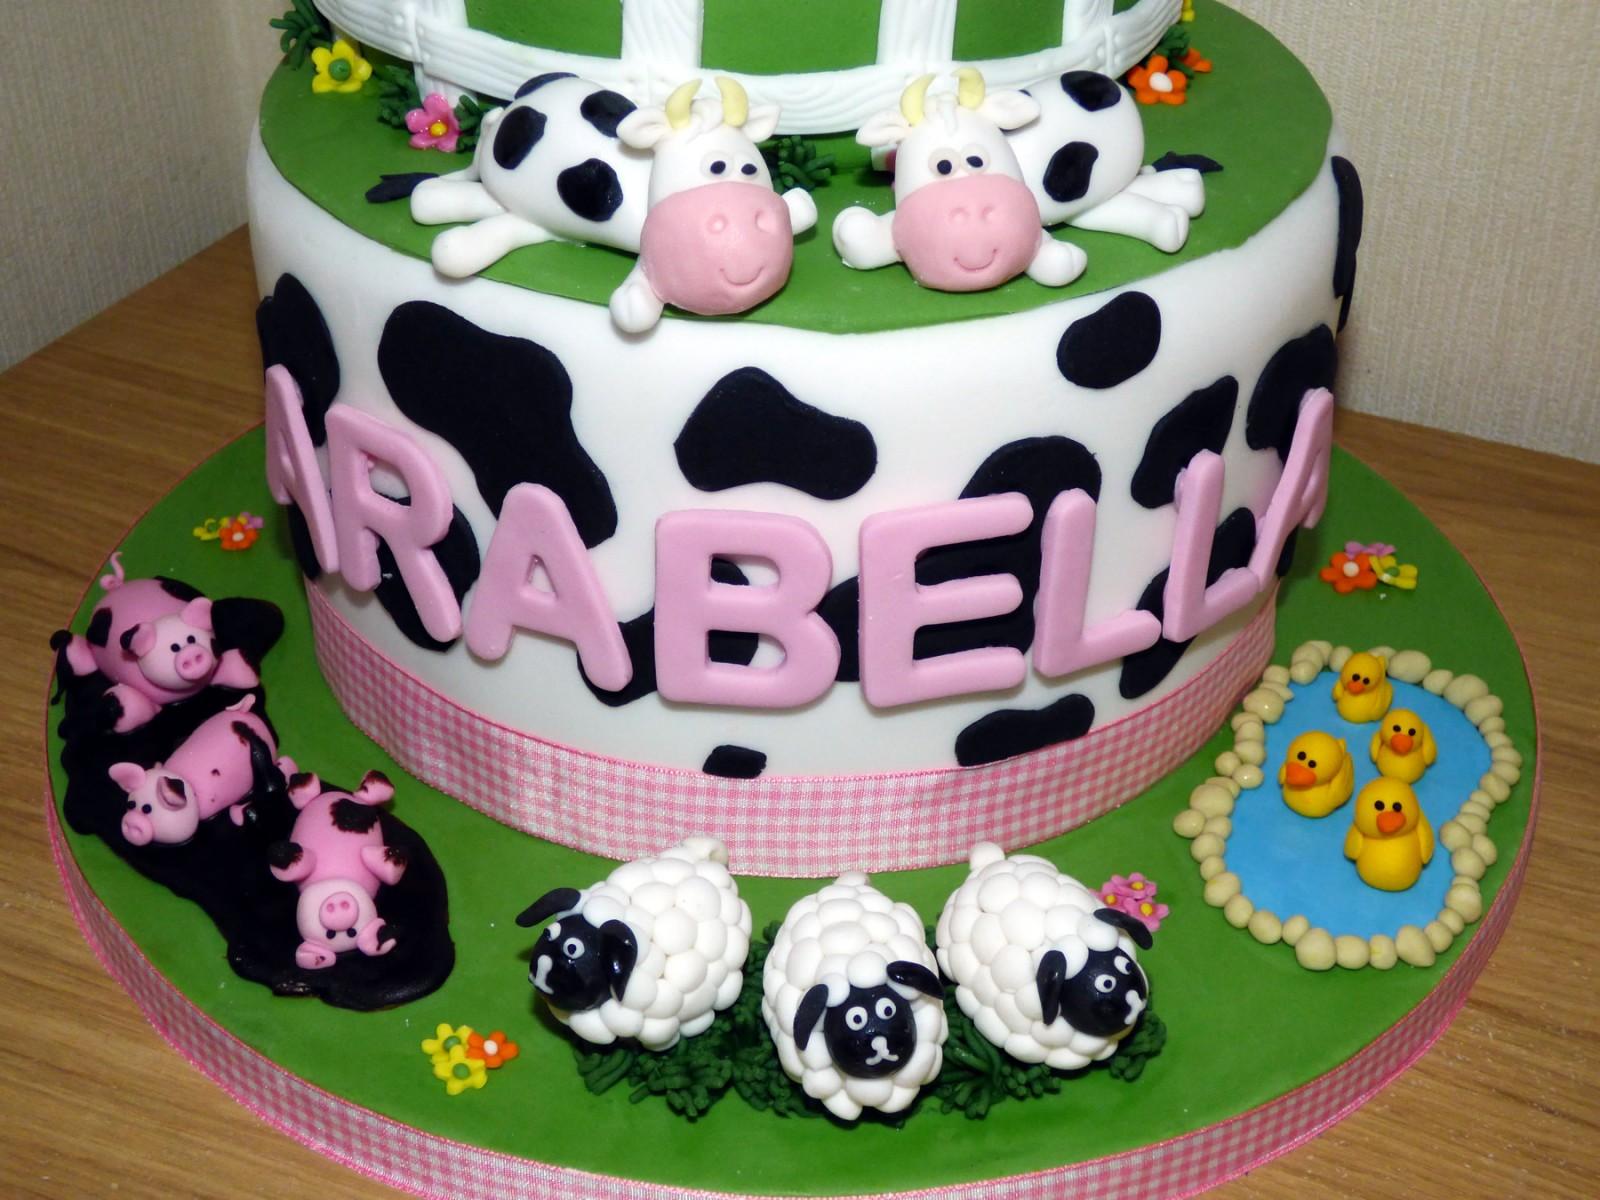 Pleasant 2 Tier Down On The Farm Birthday Cake Susies Cakes Funny Birthday Cards Online Unhofree Goldxyz